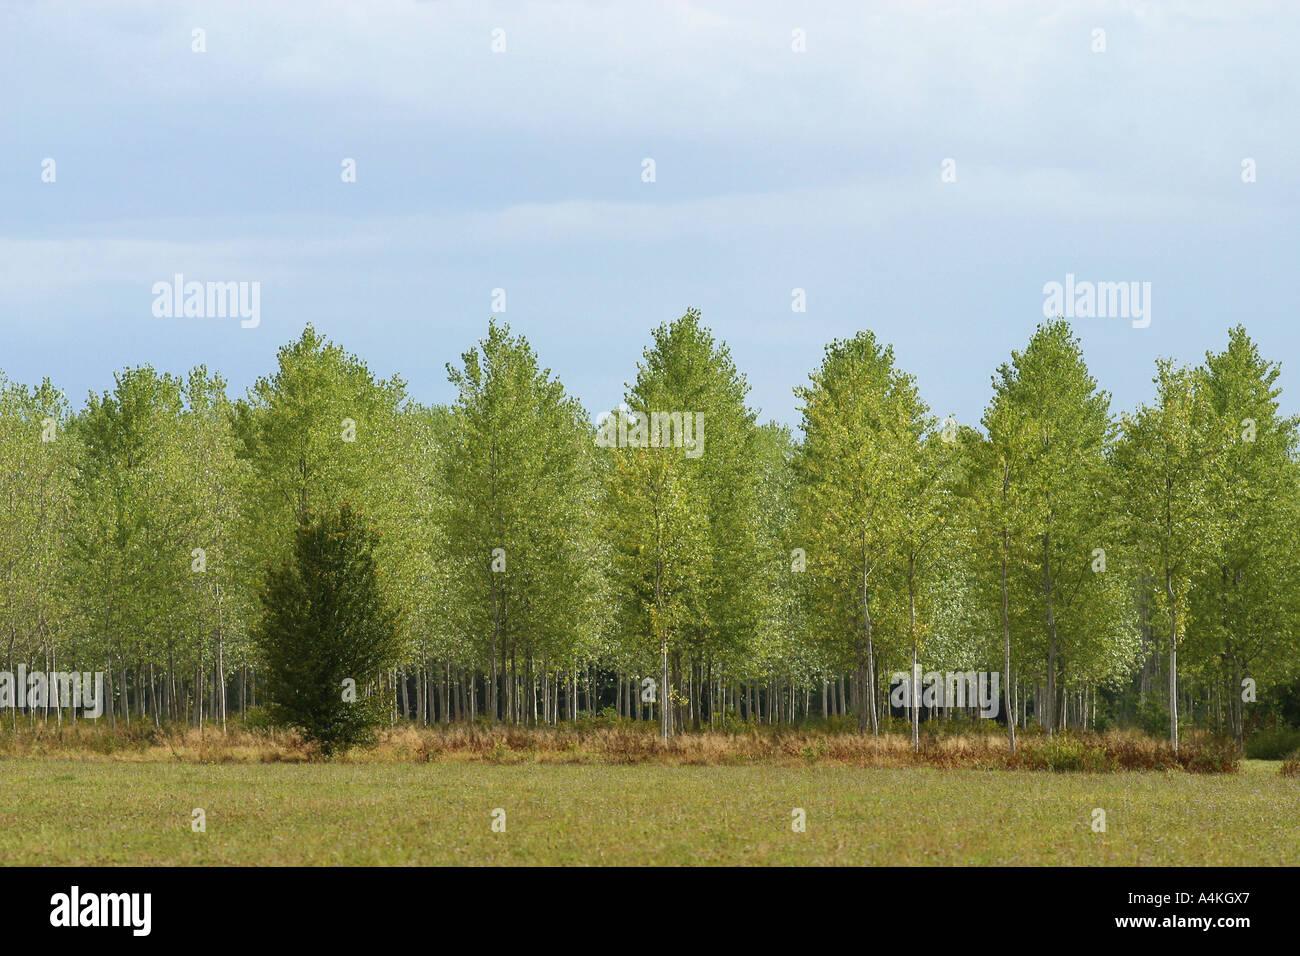 Poplar trees - Stock Image